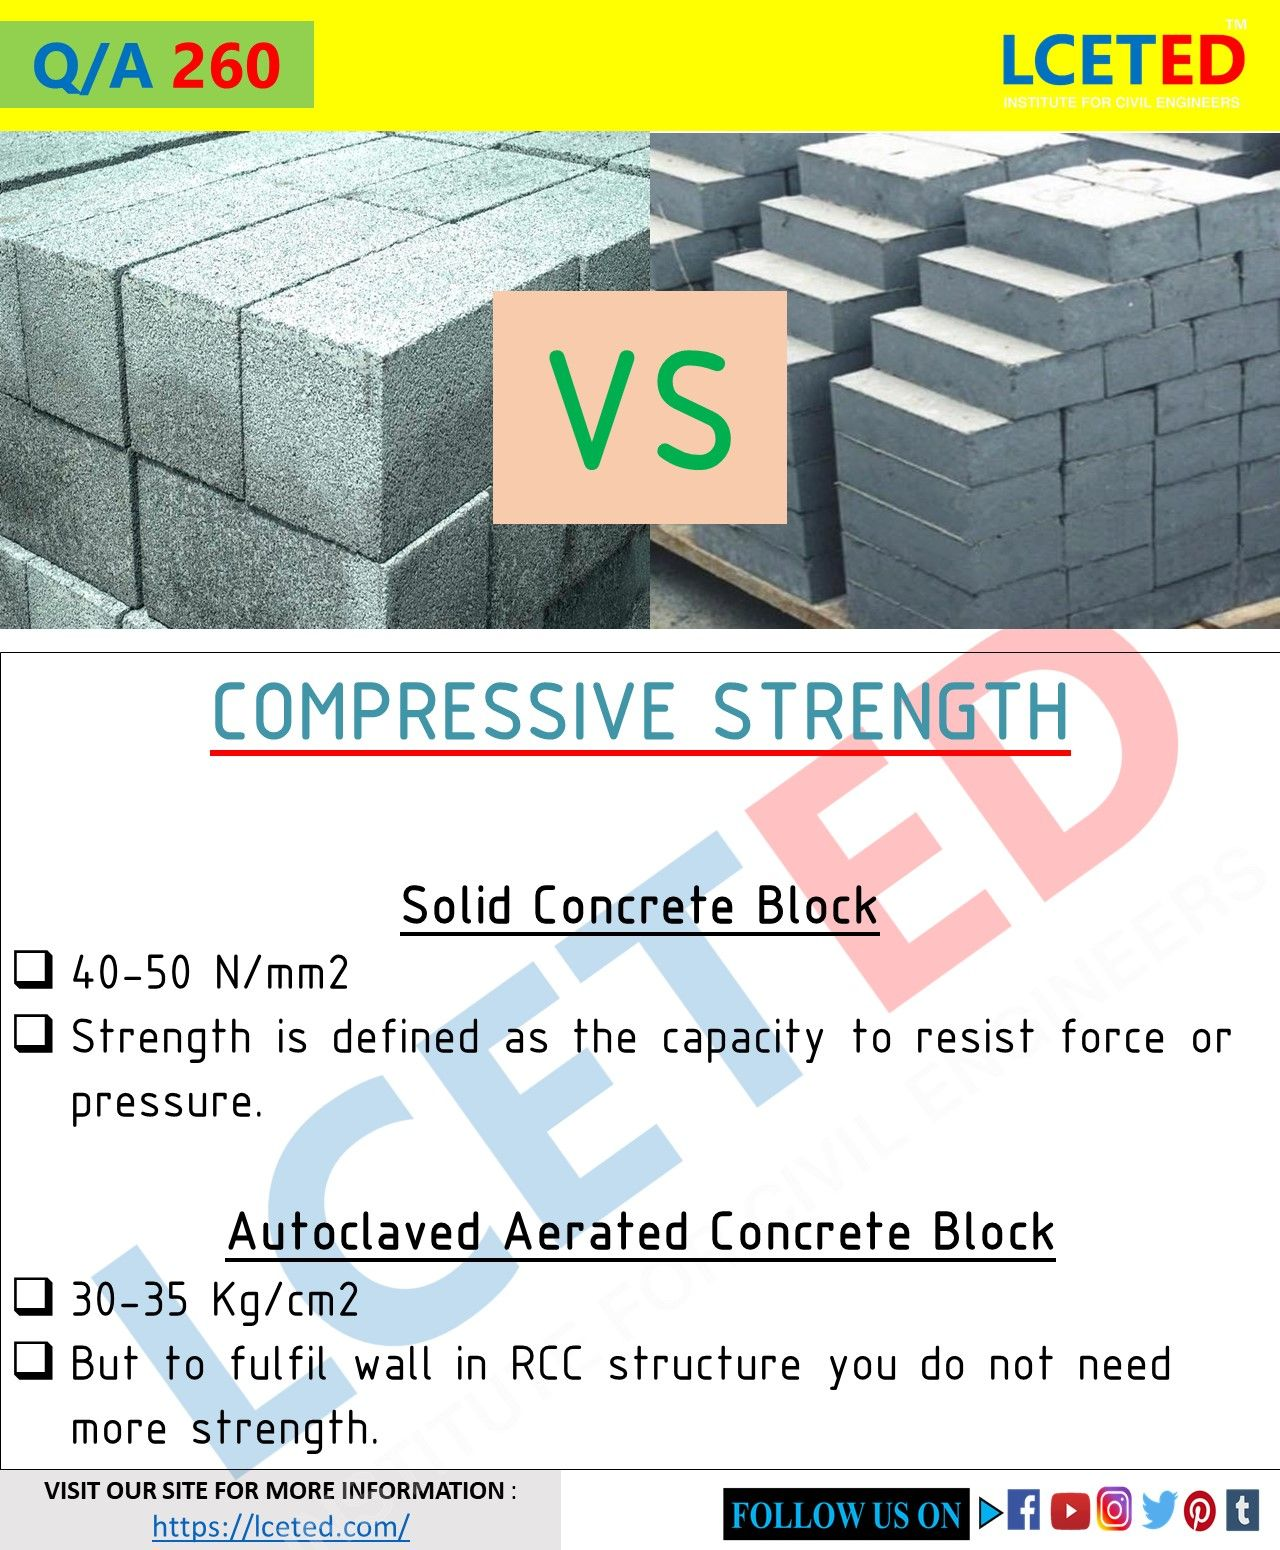 Q A 260 Compressive Strength Of Aac Blocks Vs Solid Blocks In 2020 Civil Engineering Handbook Civil Engineering Design Civil Engineering Construction